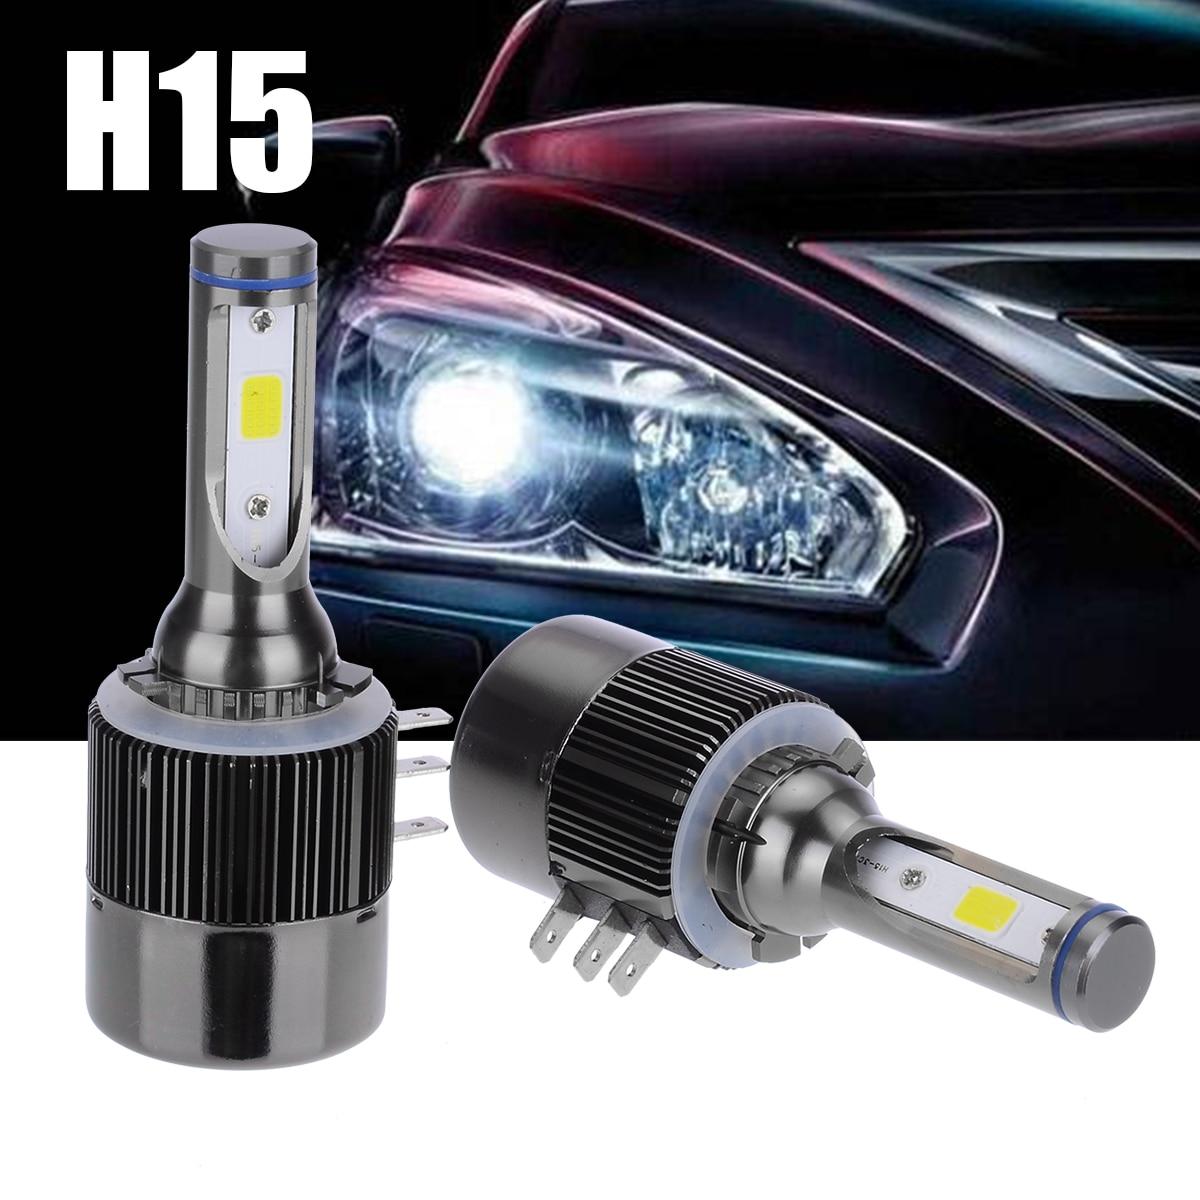 2pcs LED 110W COB 20000LM Headlights Conversion Kit Auto Car Headlight Set Bulb